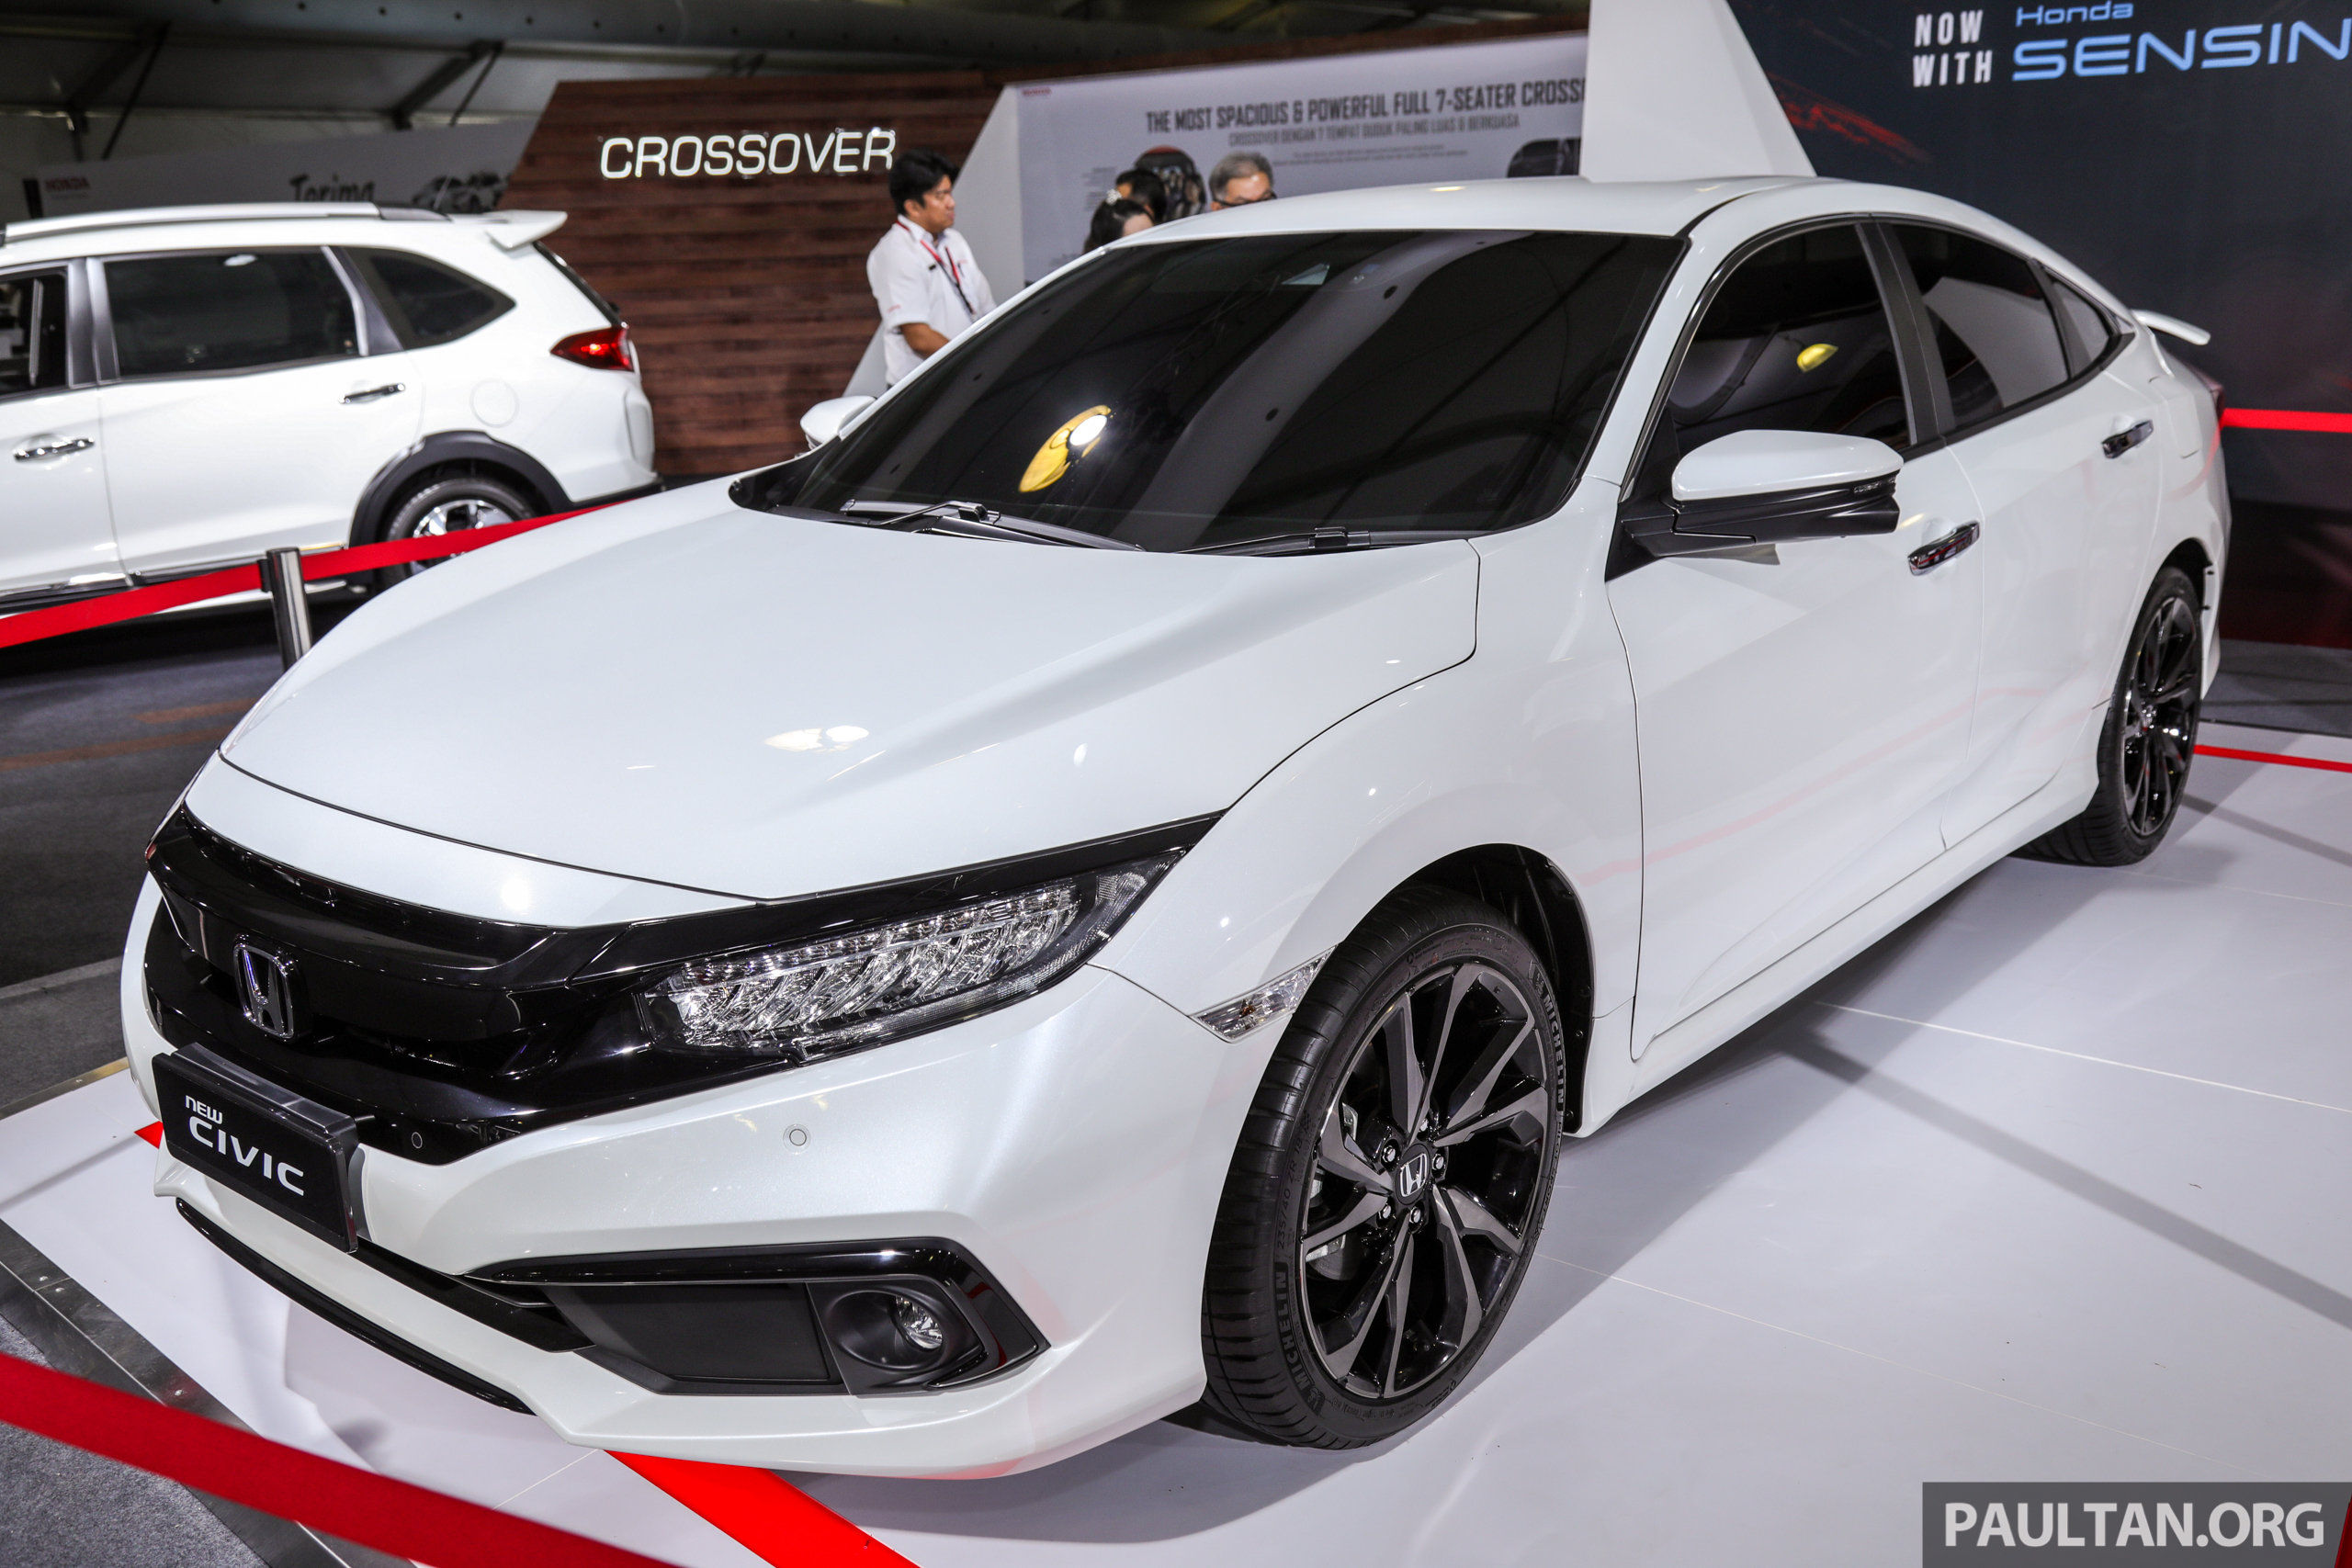 Kelebihan Kekurangan Harga Mobil Civic 2019 Harga